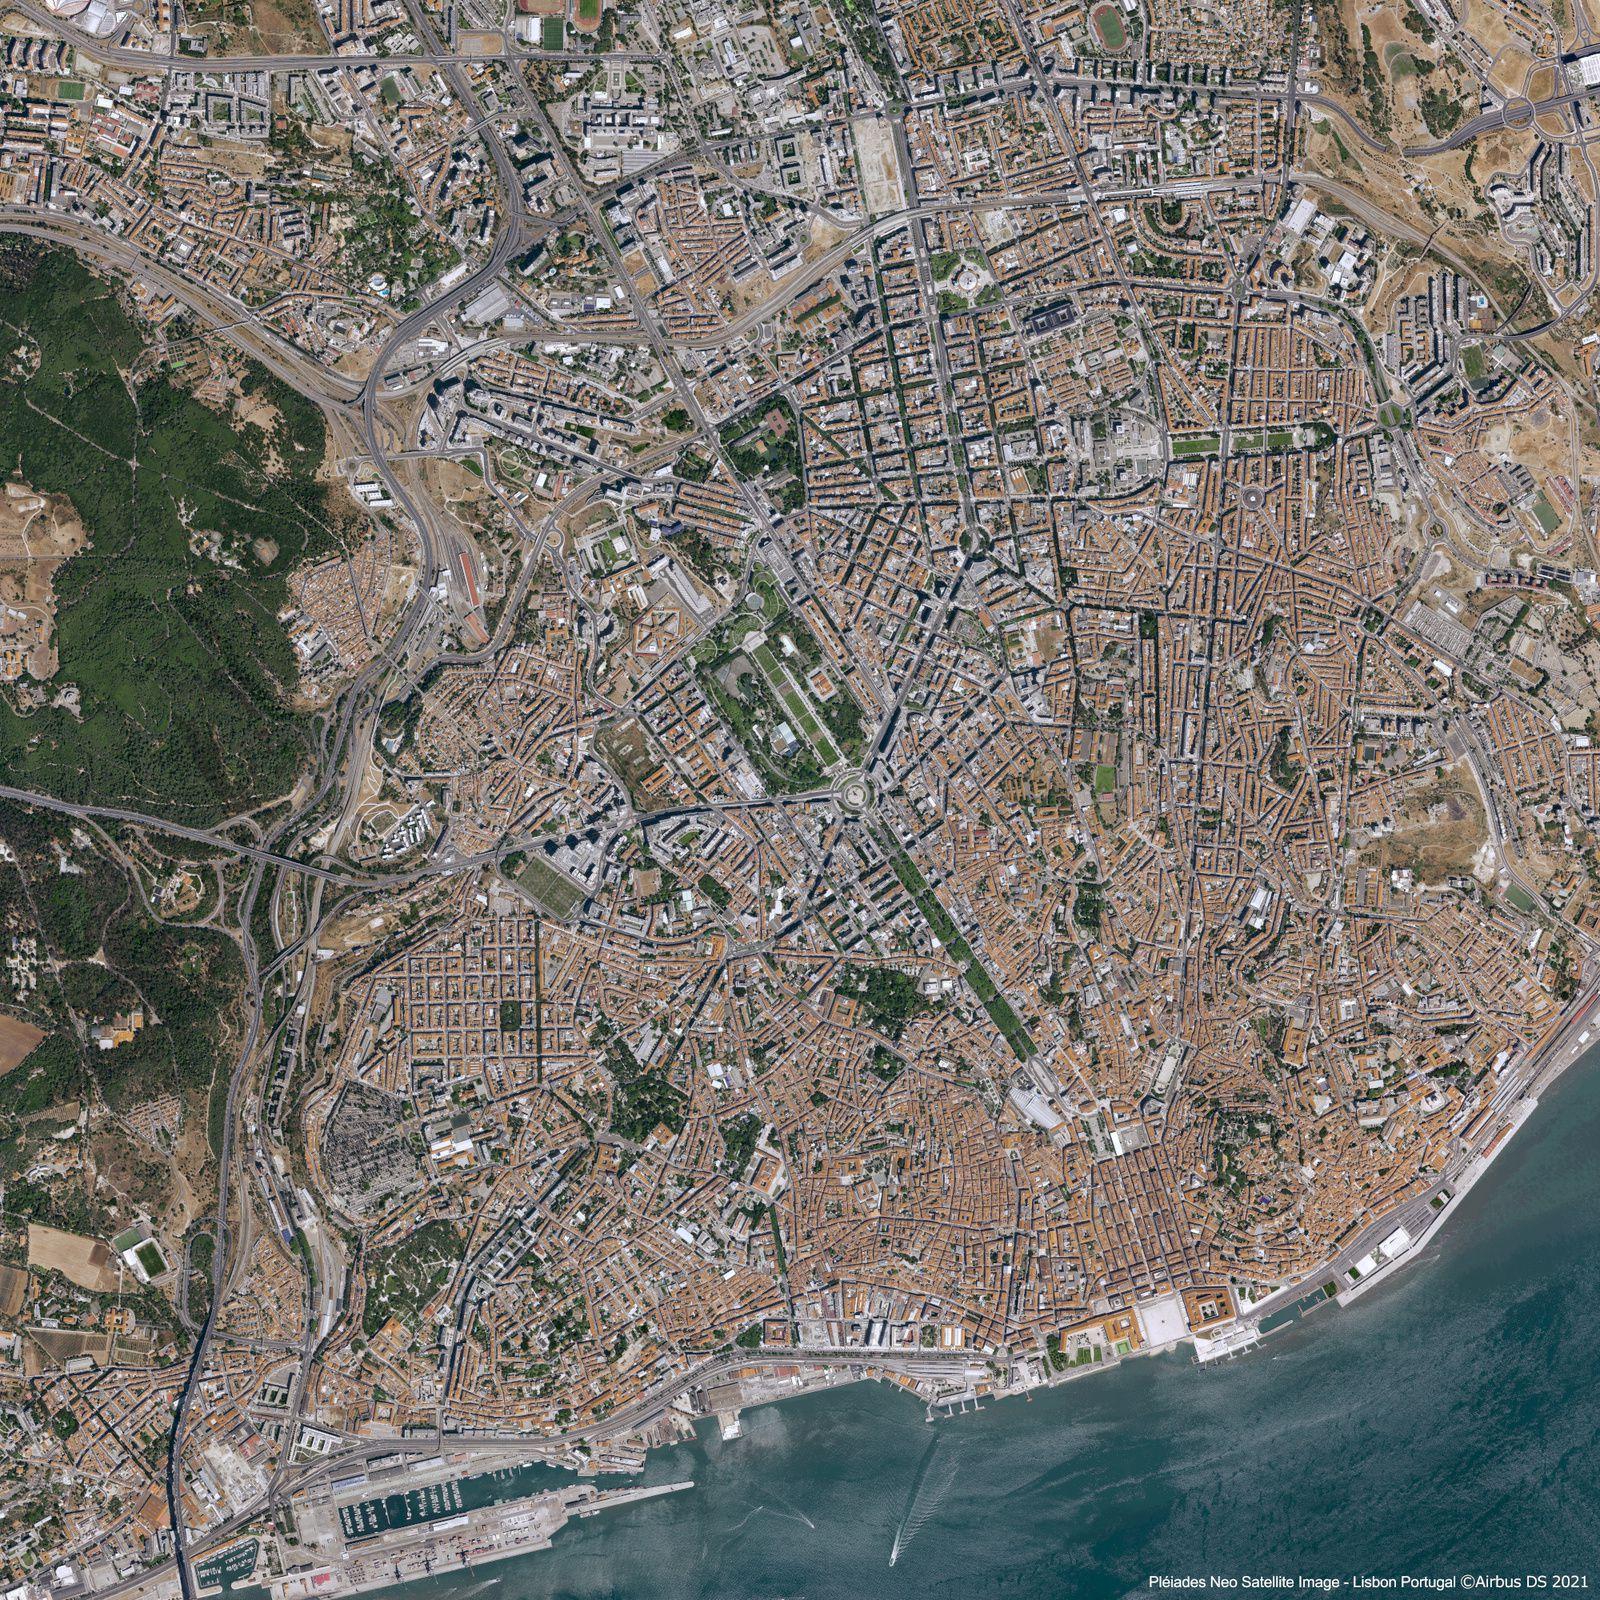 Pléiades Neo 4 - Lisbonne - Lisbon - Lisboa - Potugal - Satellite - First image - Premières images - Airbus Defence and Space - Earth Observation